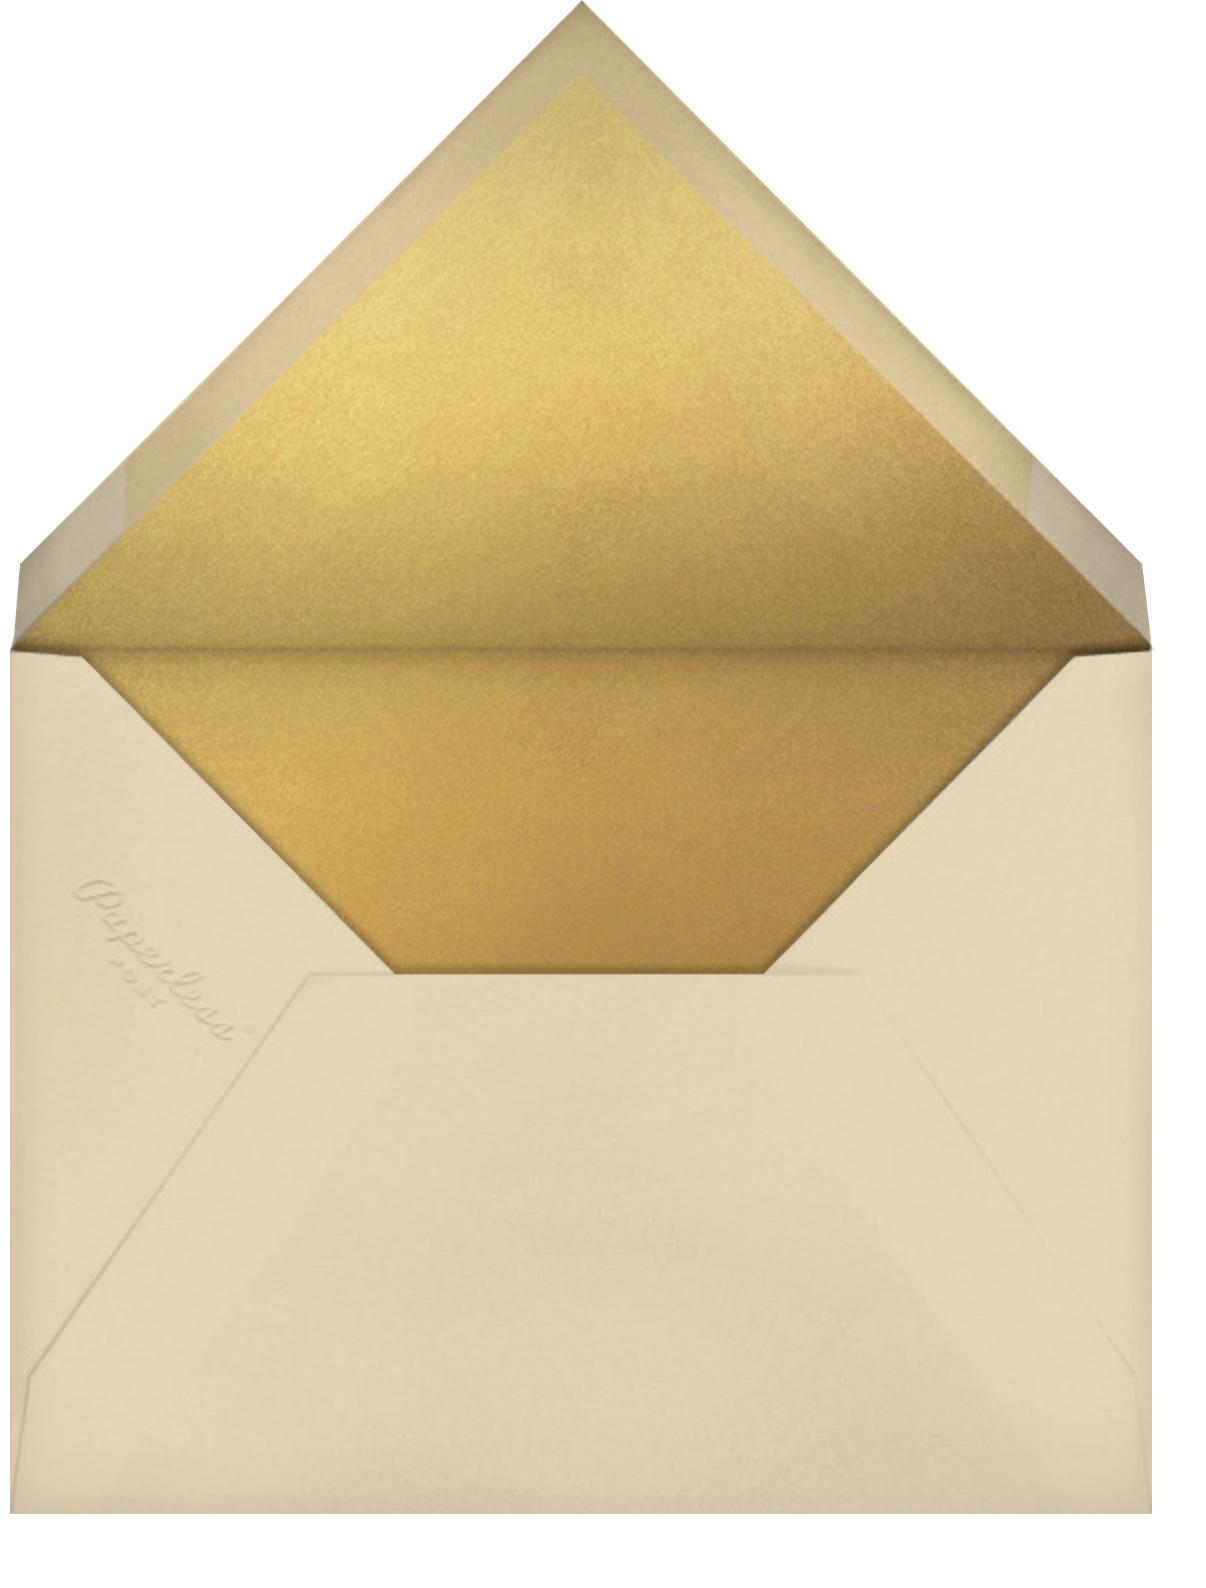 Fresh Leaves - Gold - Paperless Post - Photo  - envelope back